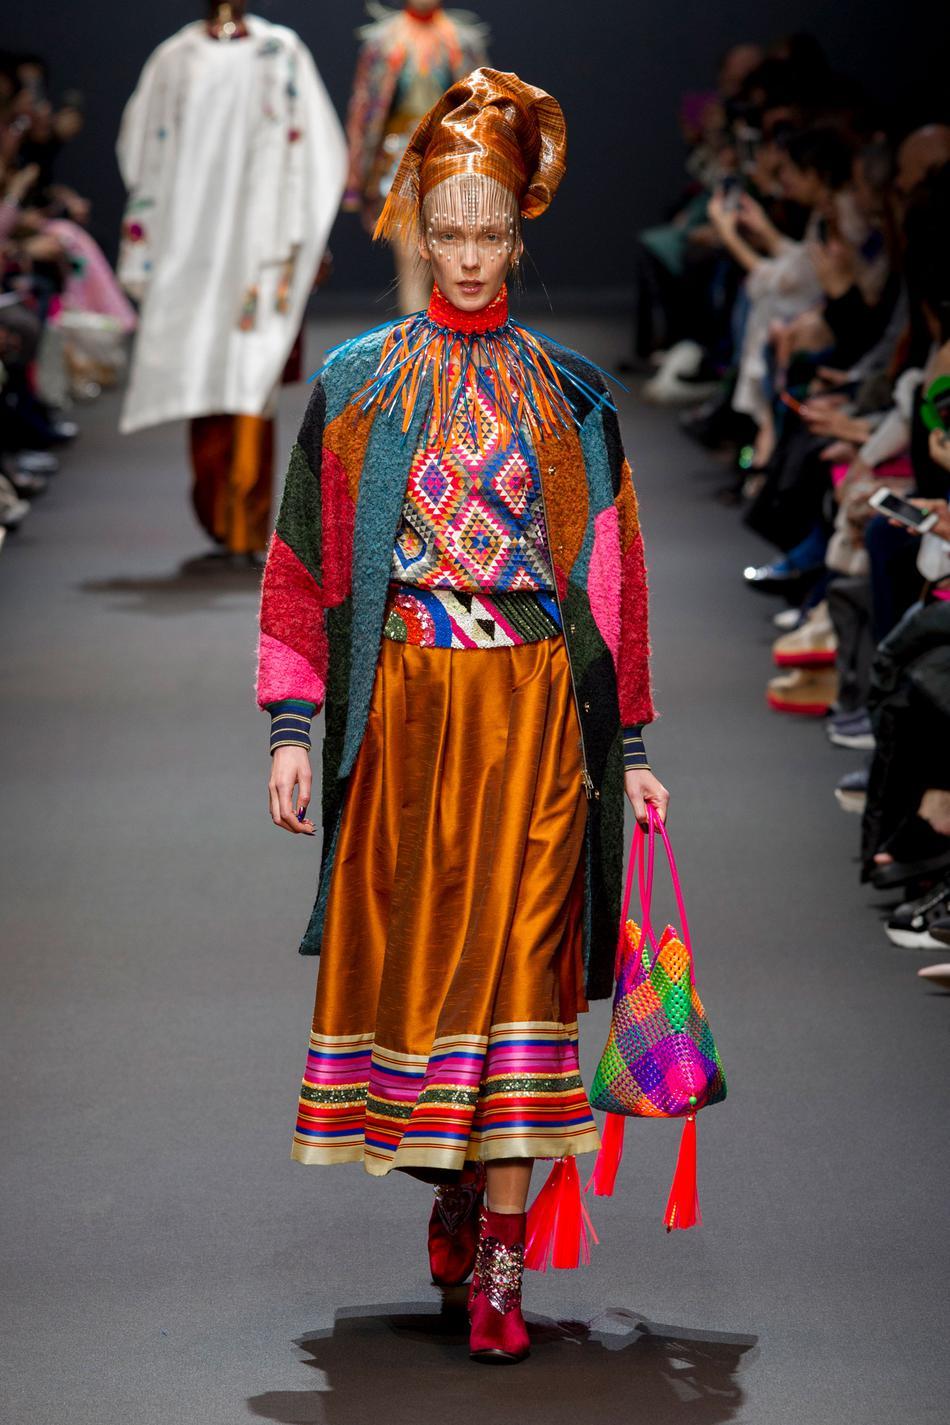 Défilé Manish Arora Fashion Week 2017 - Look 13